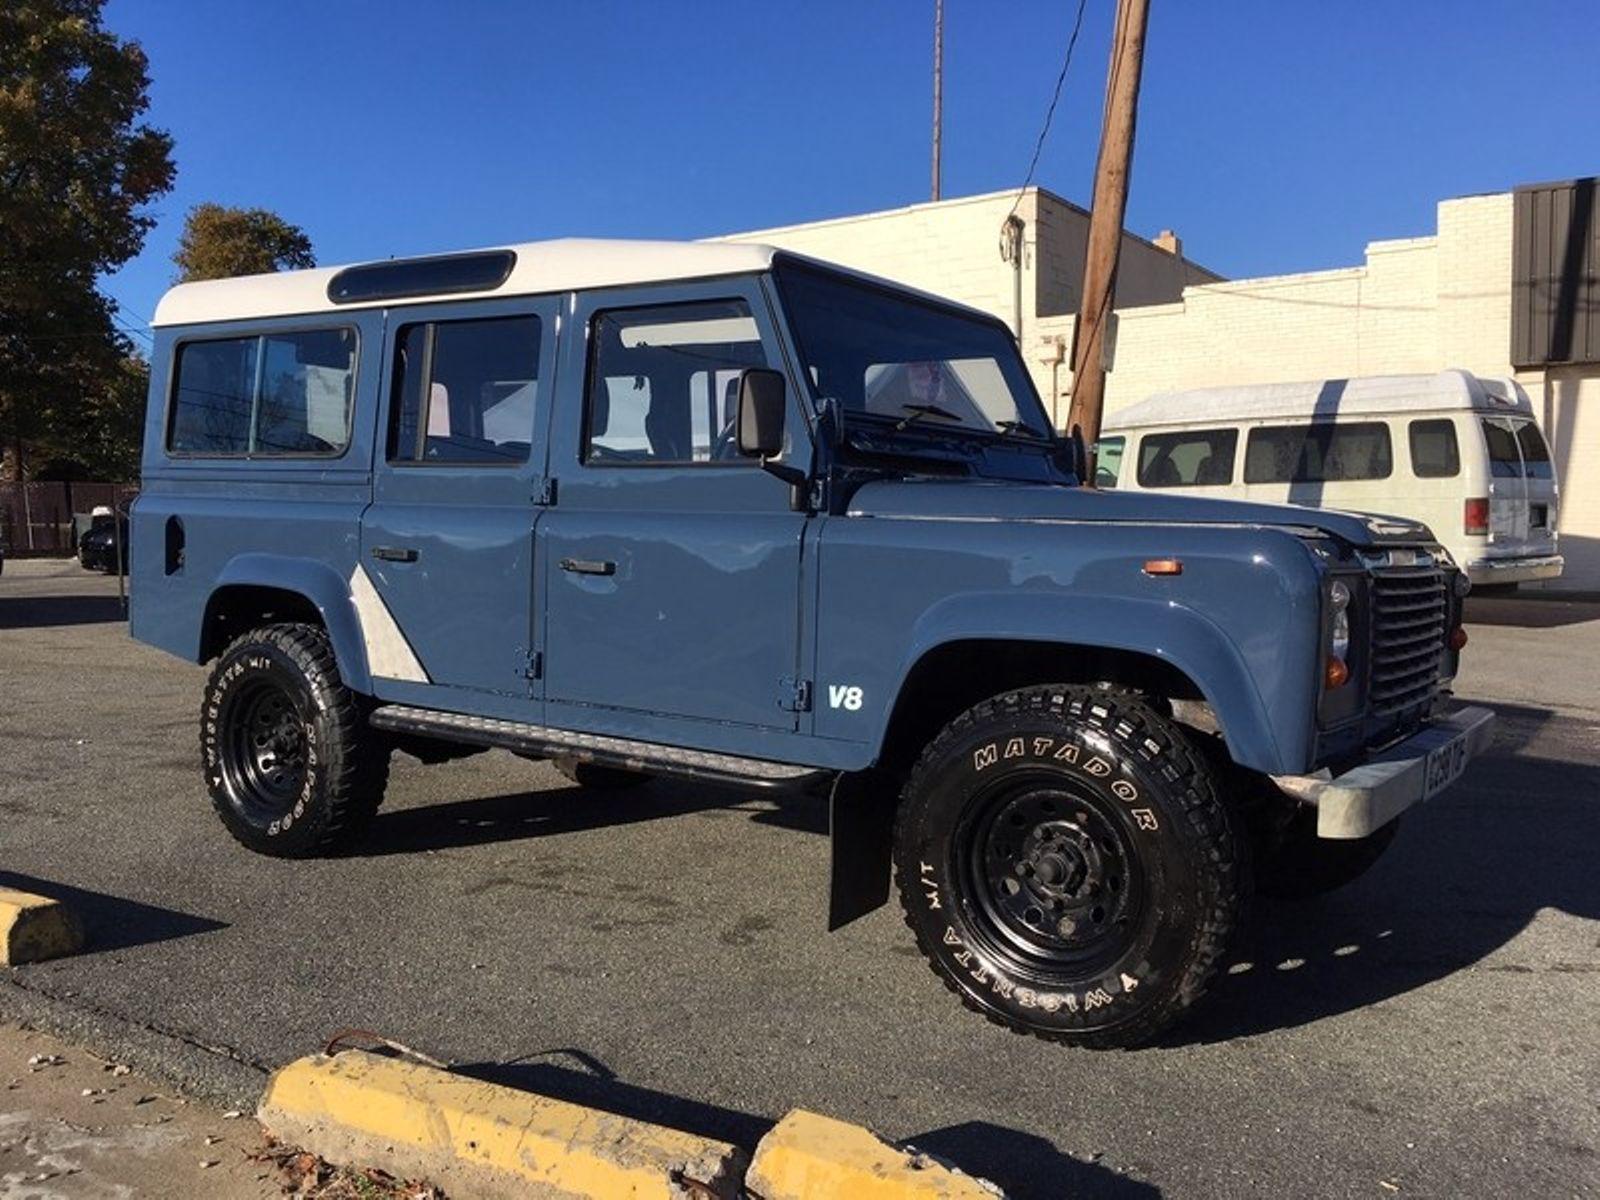 Used Land Rover Defender Used Car Dealer Richmond